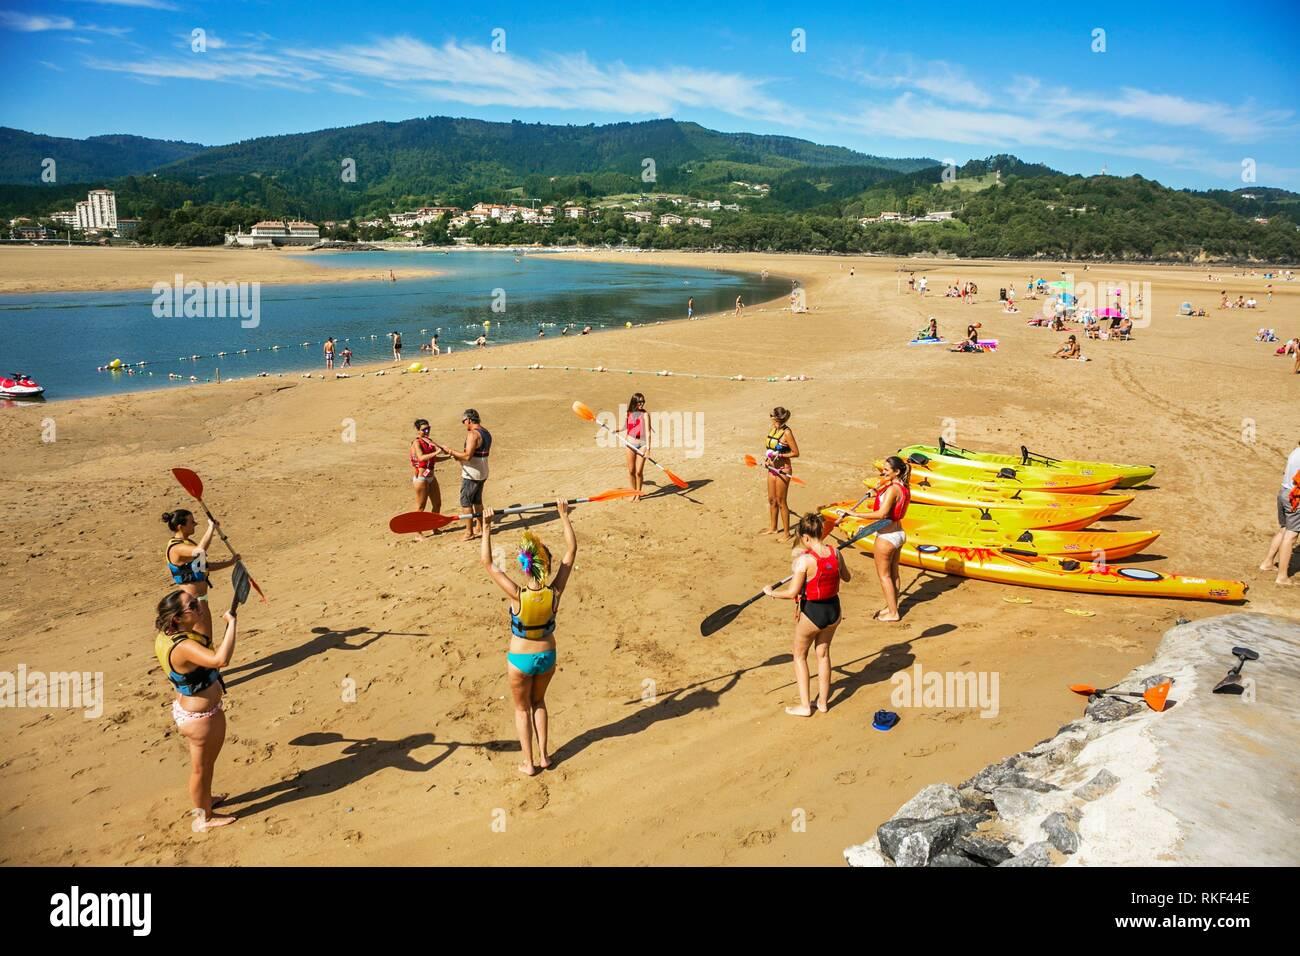 Canoeing lessons at Laida Beach. Urdaibai biosphere Reserve. Urdaibai Region. Bizkaia. Basque Country. Spain. - Stock Image